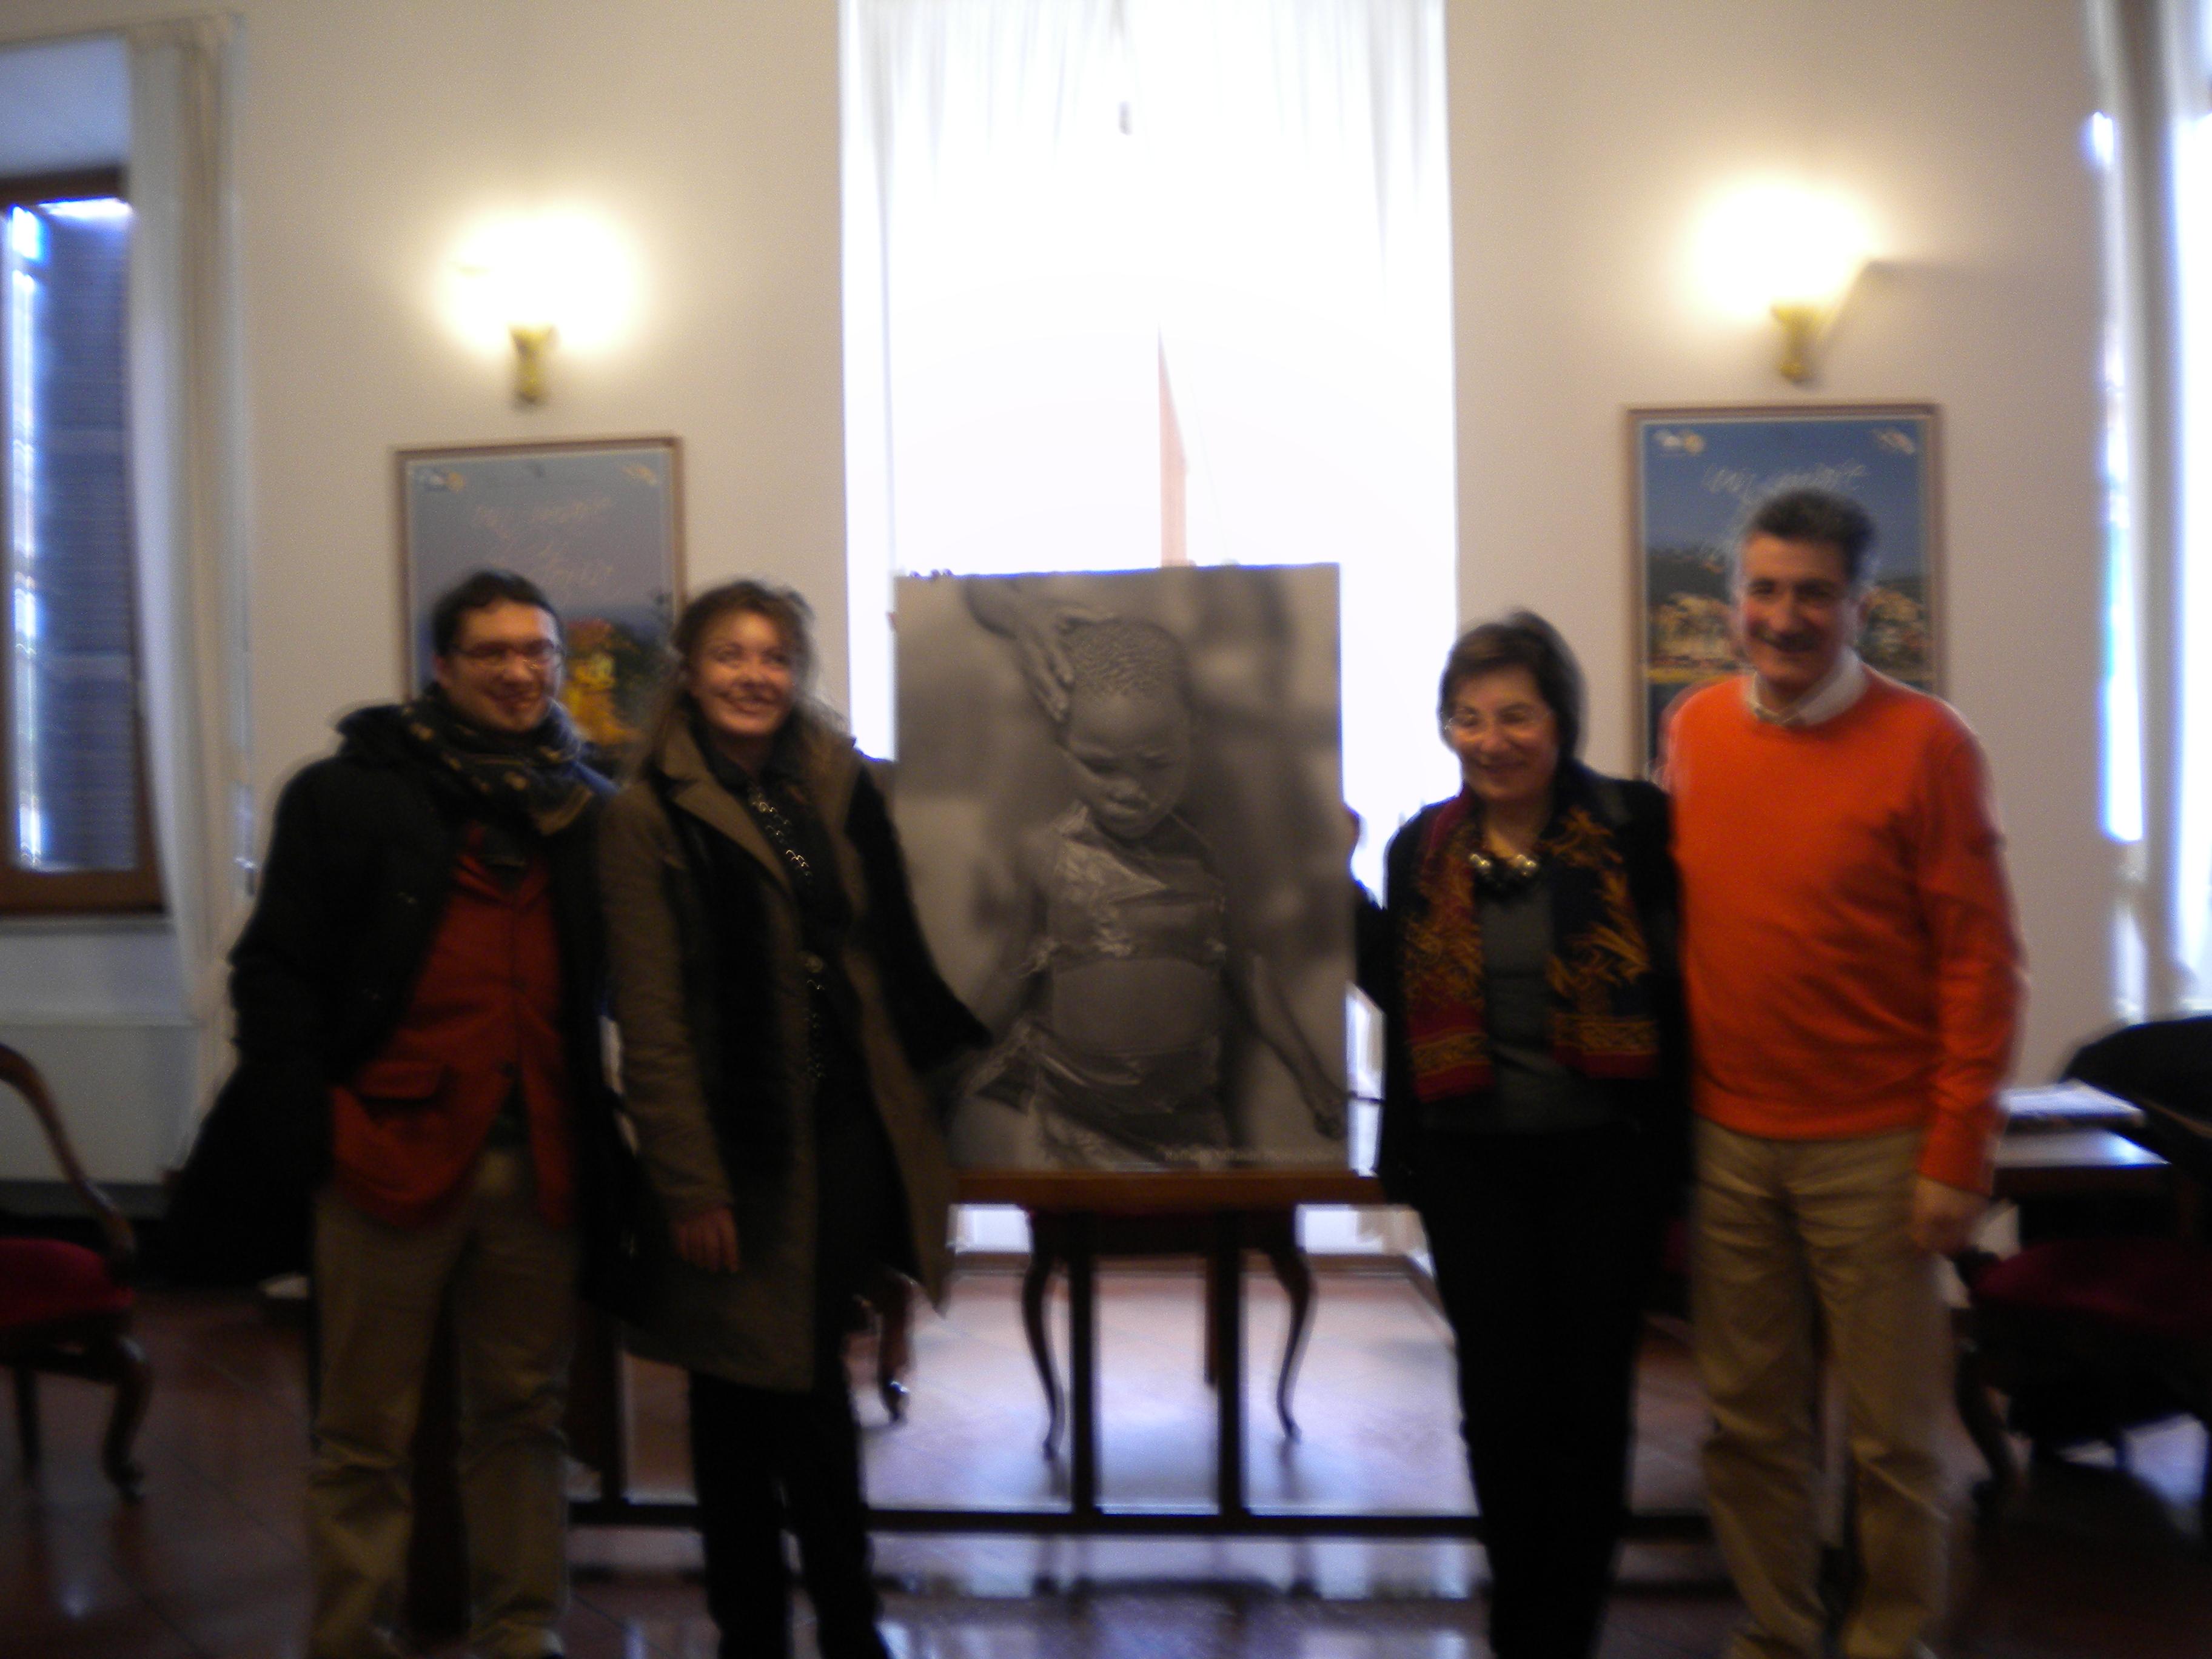 Sergio Vallorani, Raffaella Milandri, Olimpia Gobbi, Luigi Merli